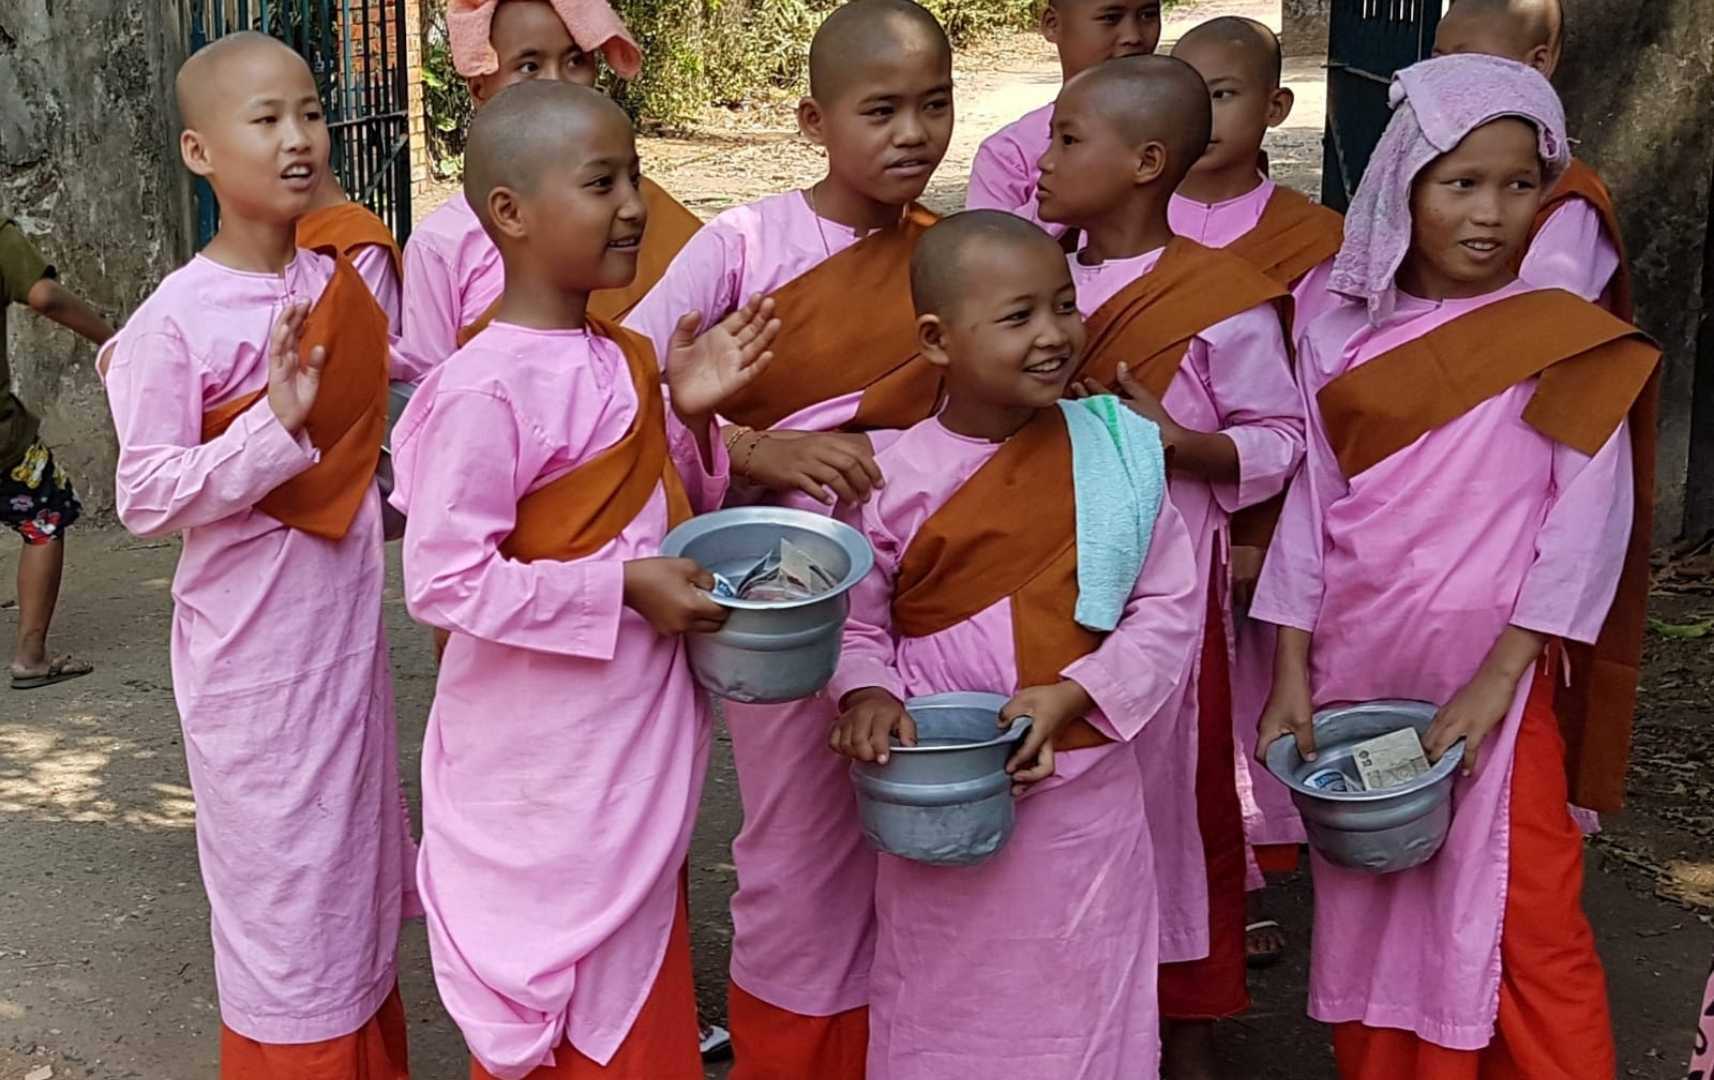 Kinder - Myanmar